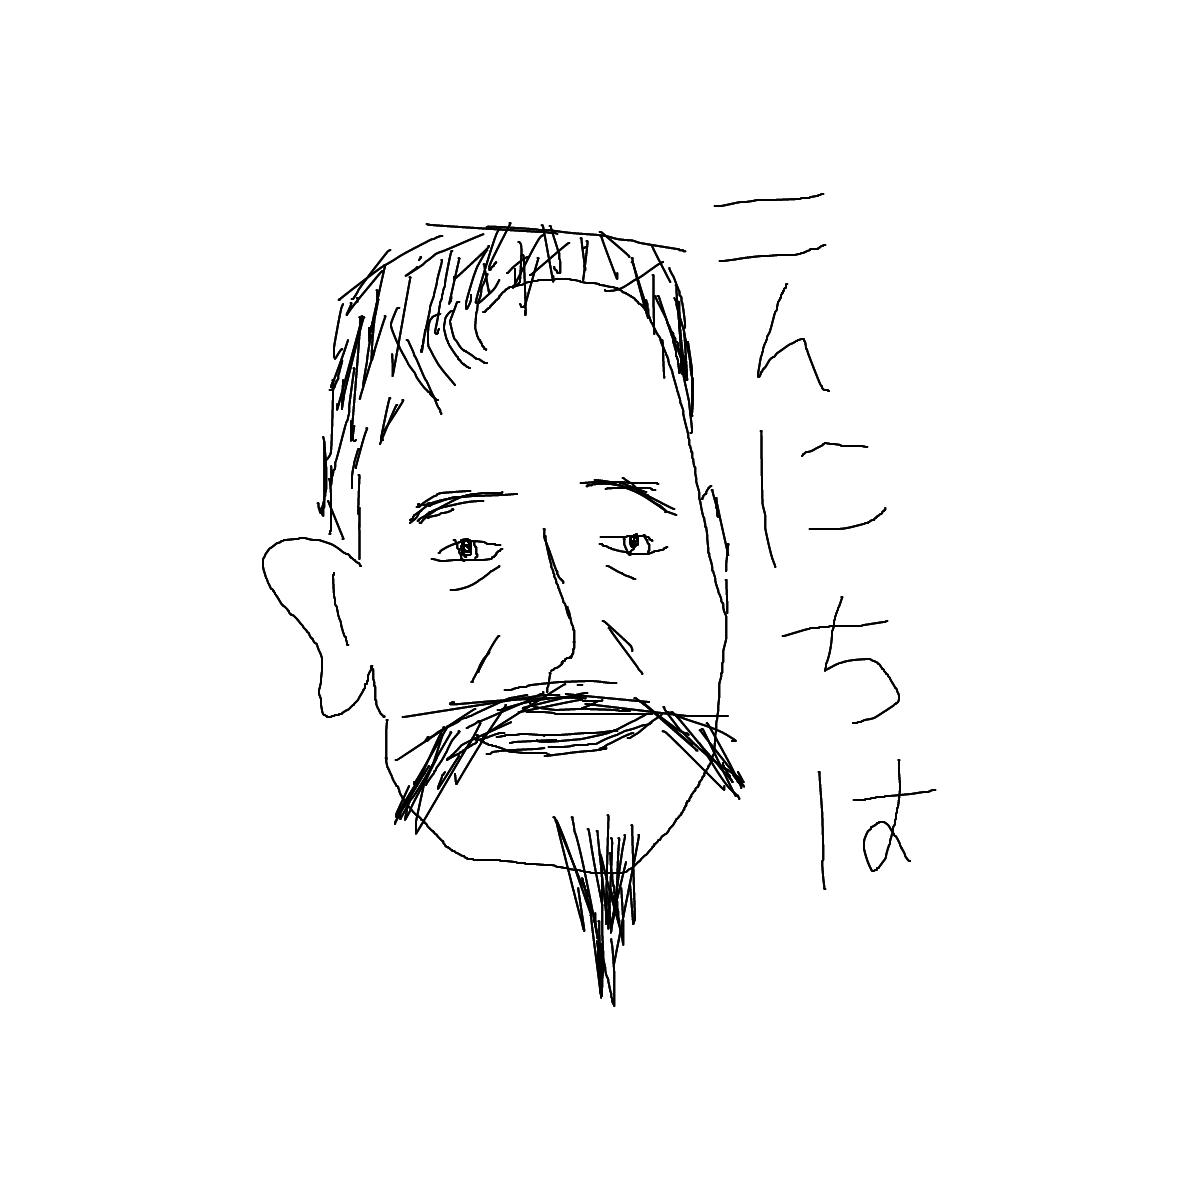 BAAAM drawing#3123 lat:33.3889961242675800lng: 90.1747360229492200